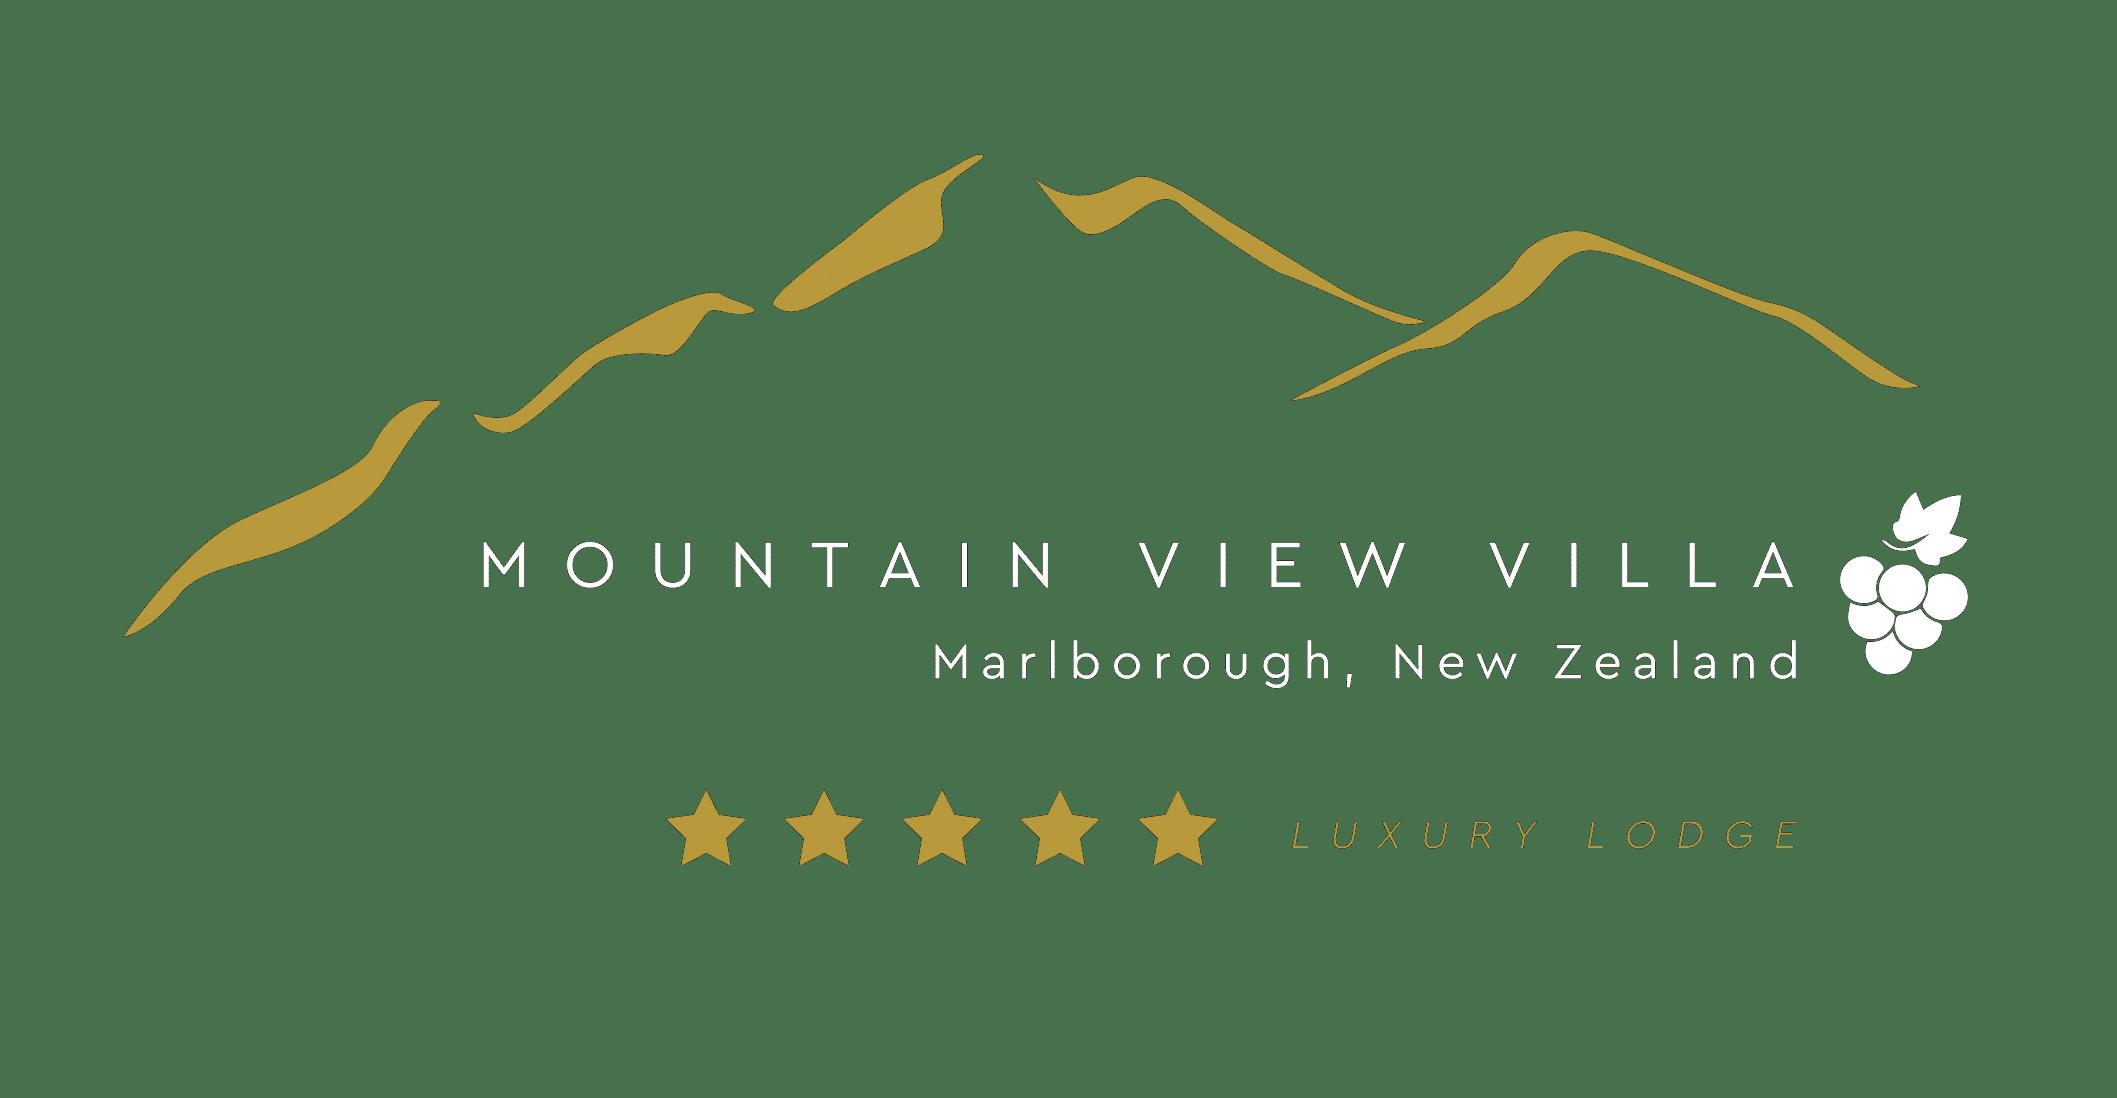 Mountain View Villa Luxury Lodge